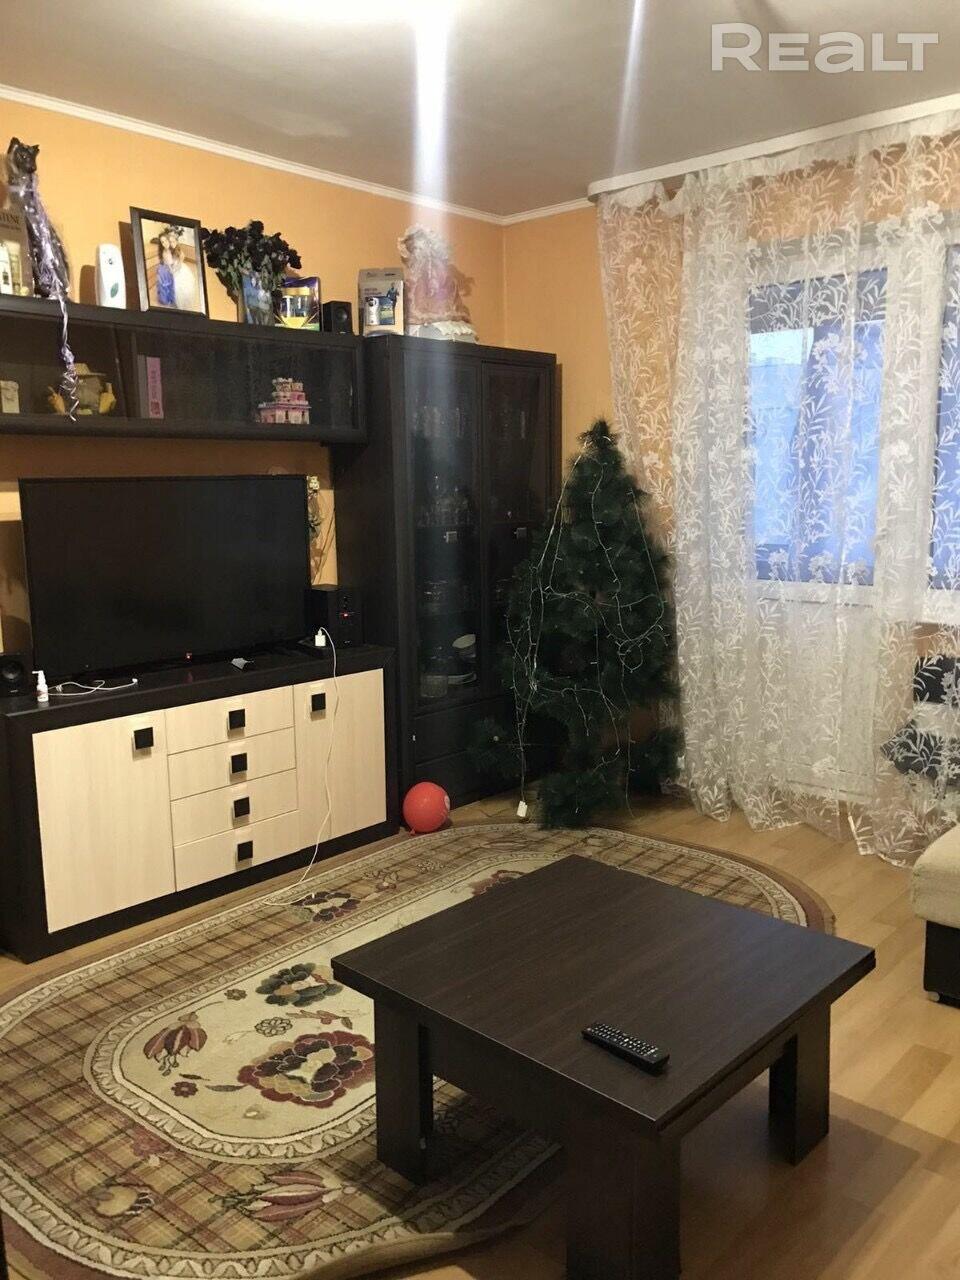 Продается 2-х комнатная квартира, Логойский тракт д.19-4 - фото №4